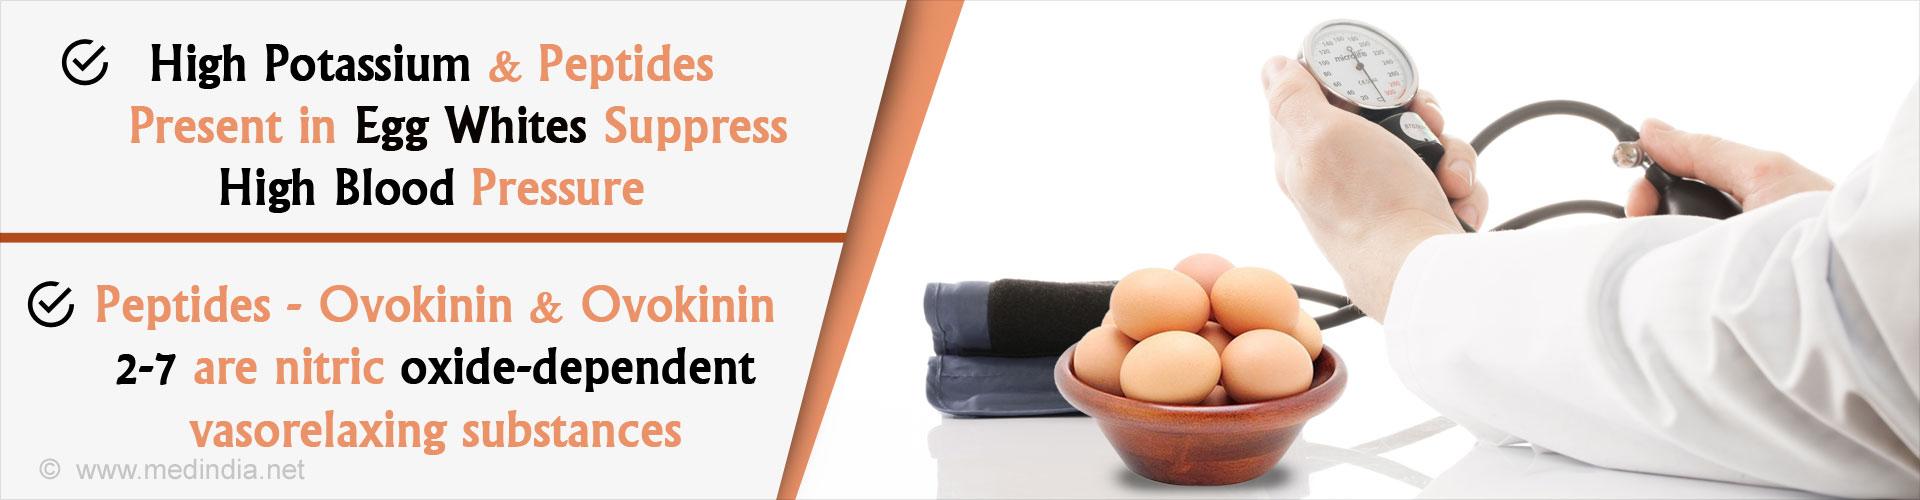 Peptides present in egg whites suppress high blood pressure